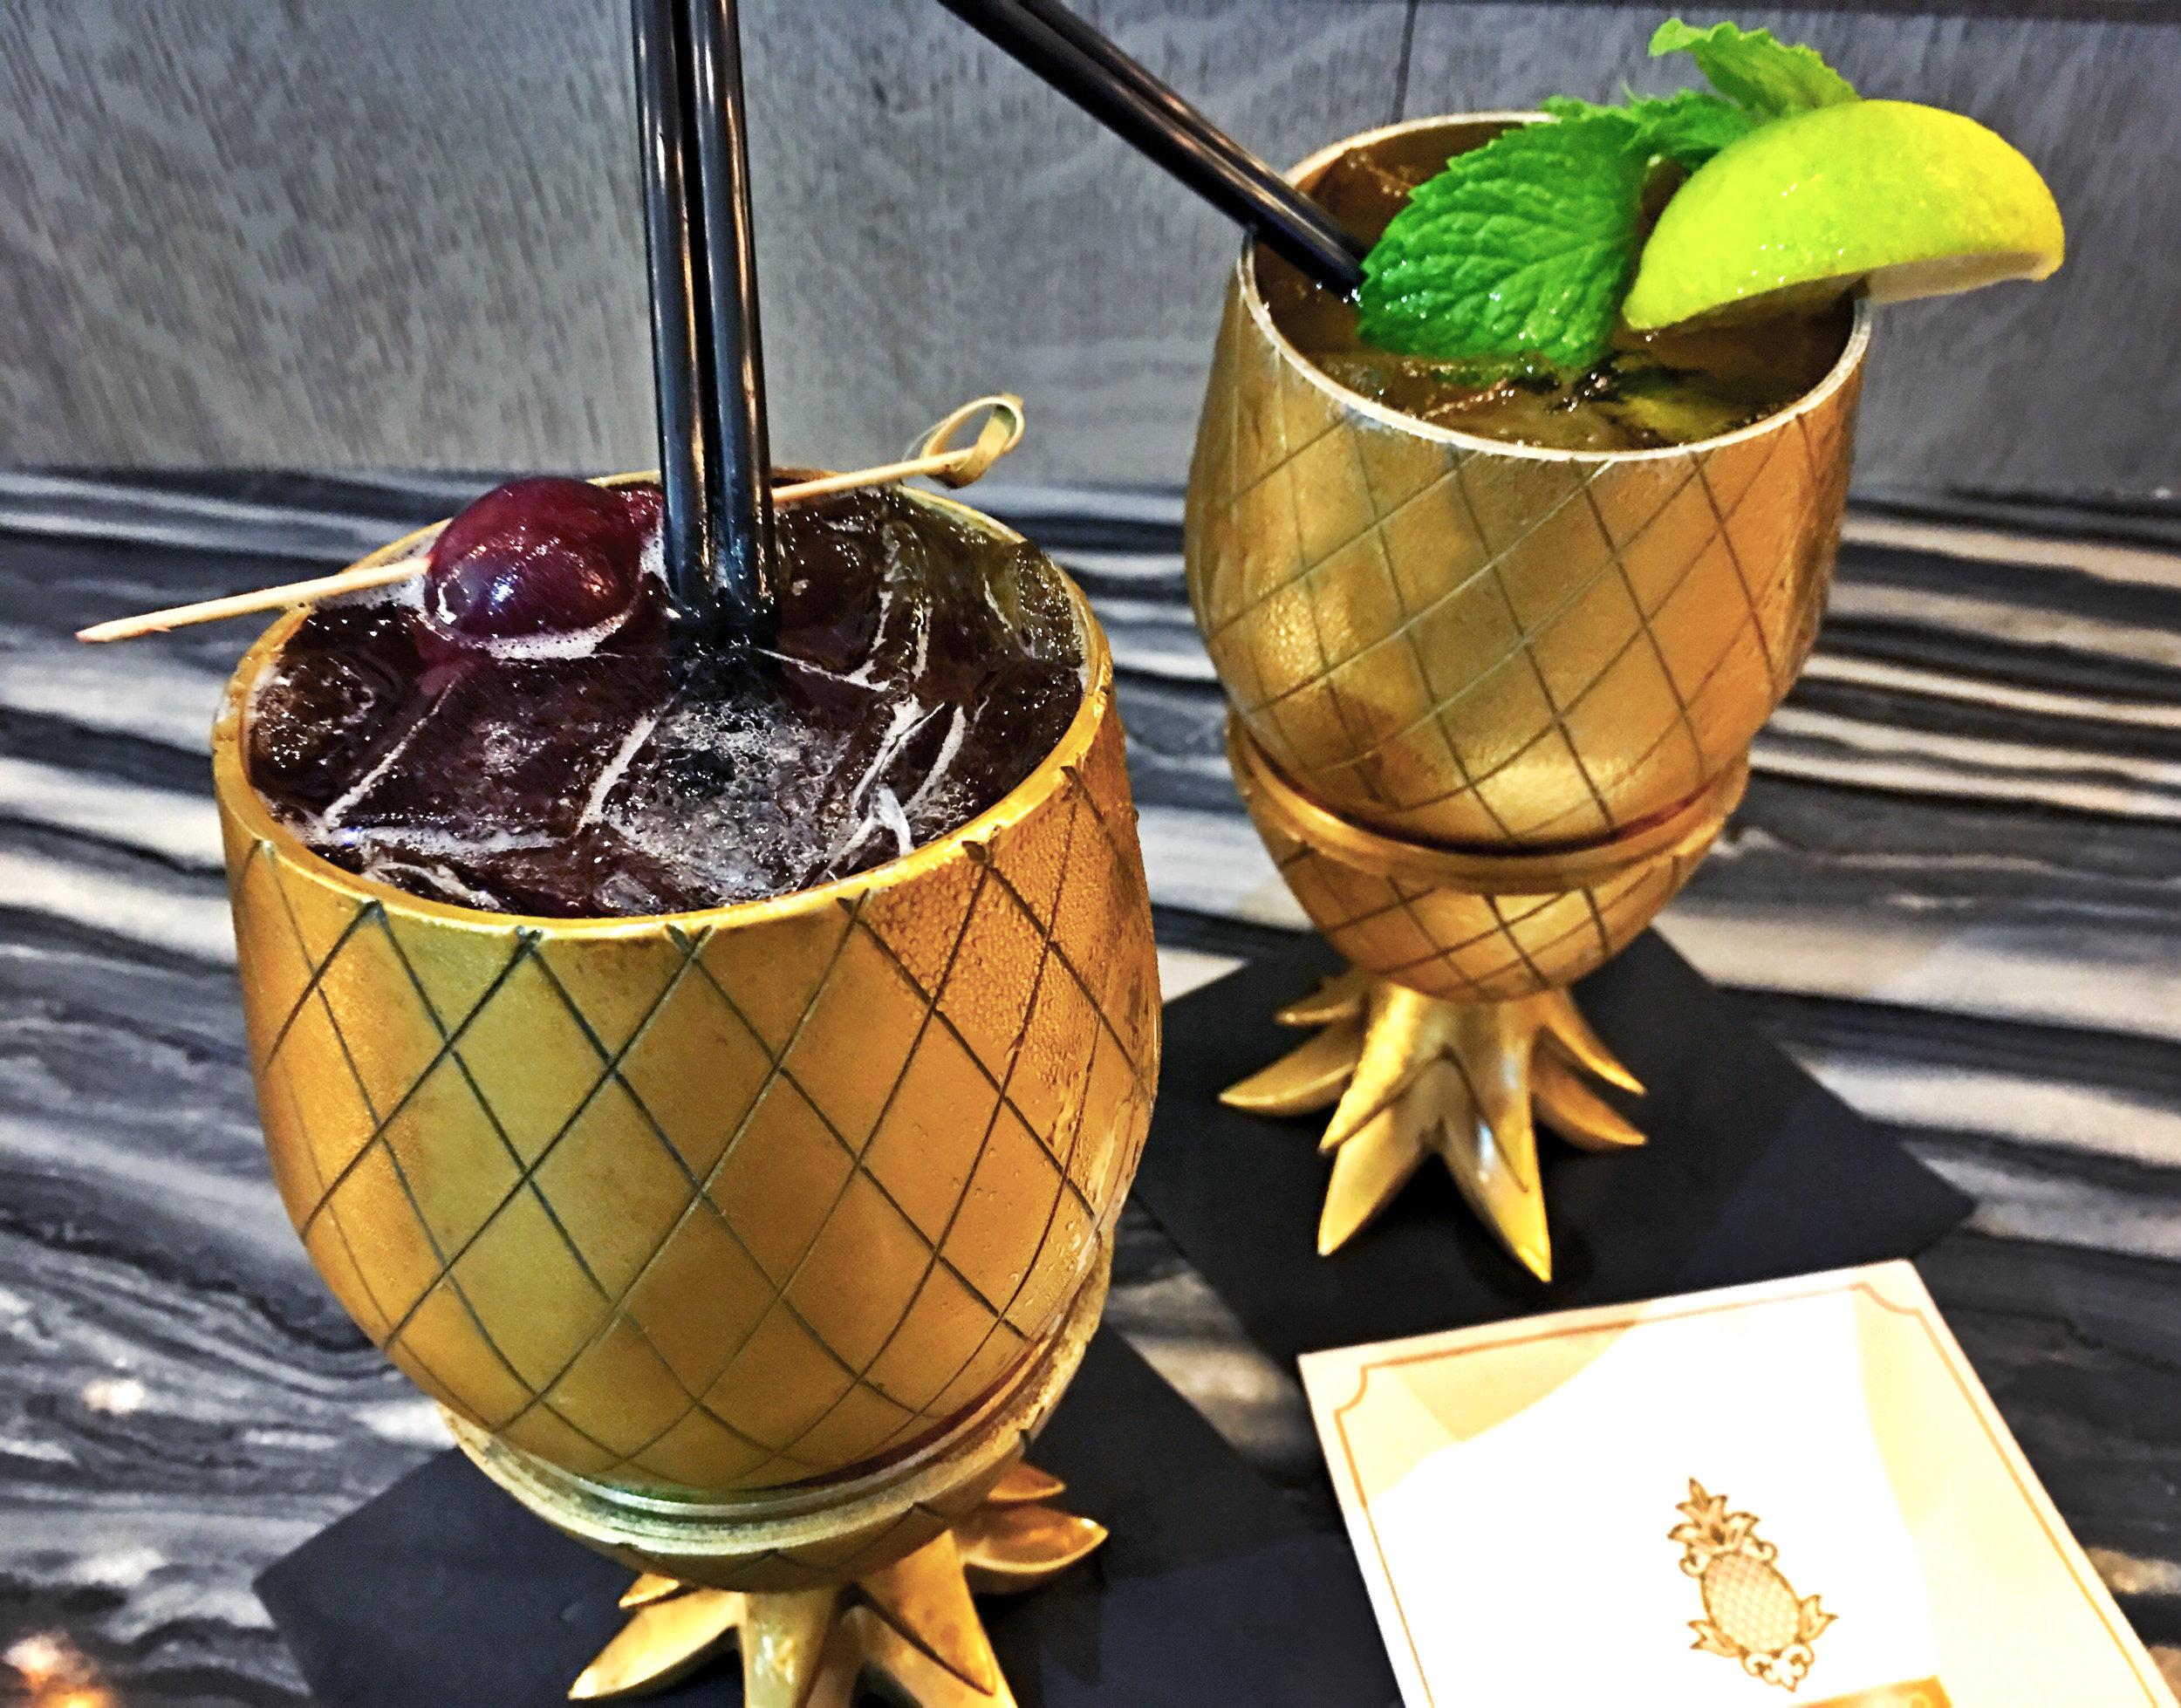 Pineapple-Express-Drink.jpg